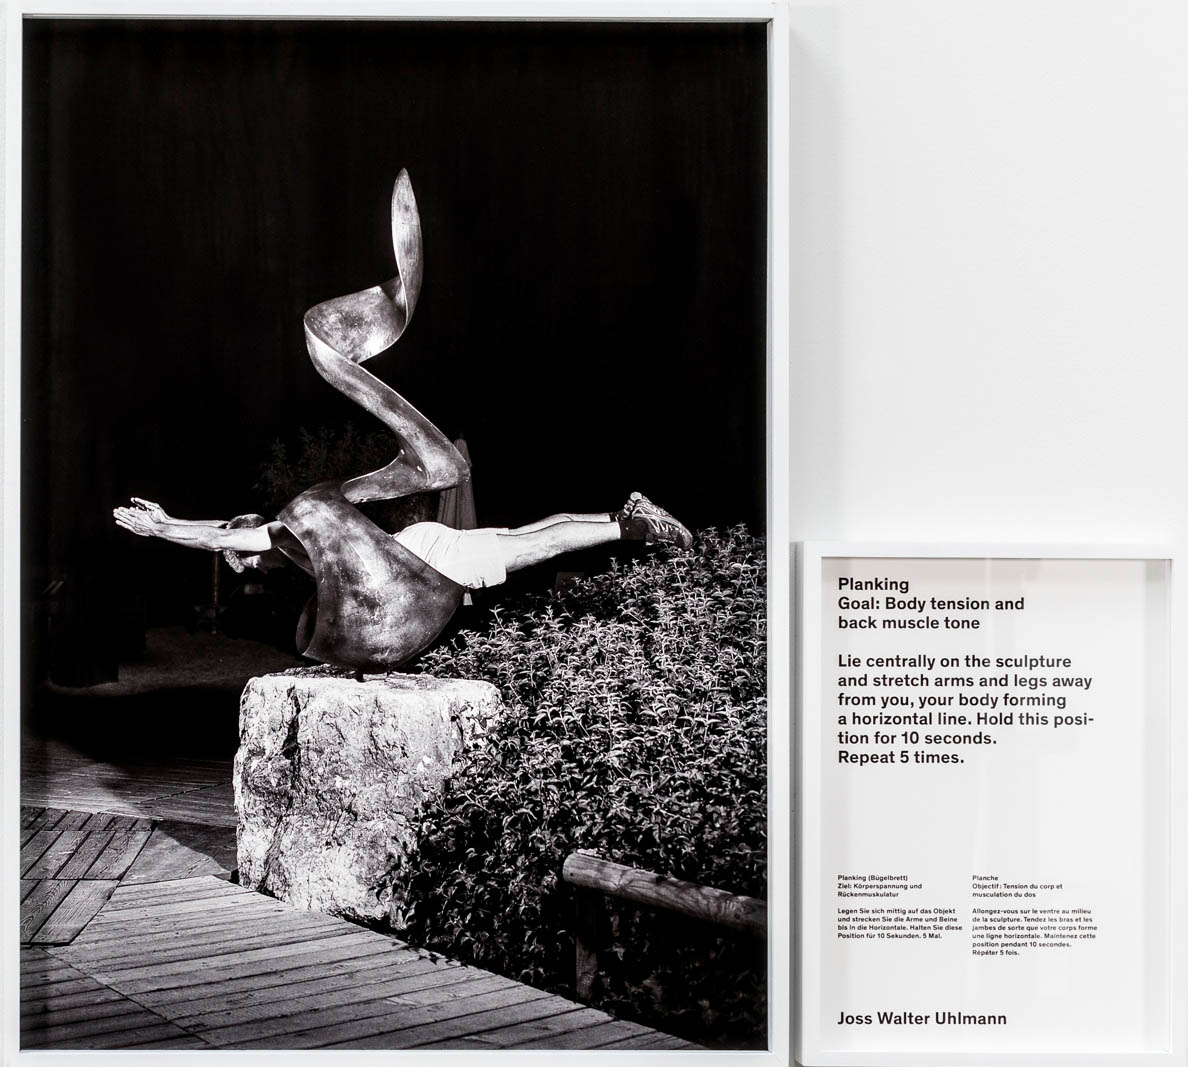 e8848903879721 Christian Jankowski,<em>Planking (Artistic Gymnastics)<em/>,